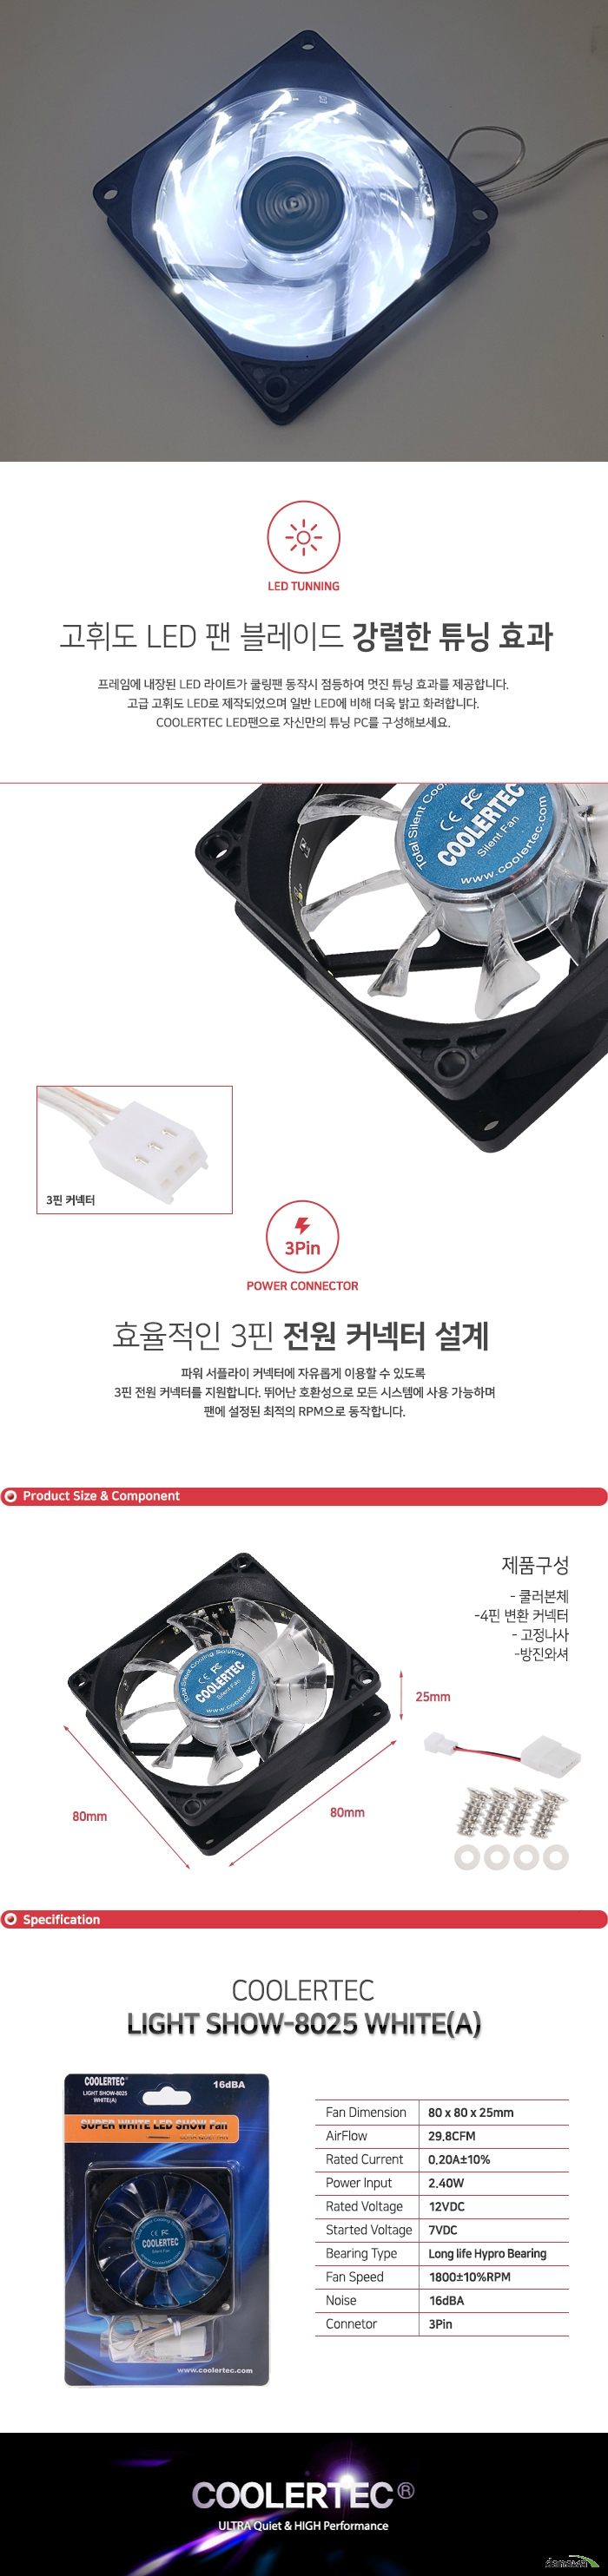 COOLERTEC LIGHT SHOW-8025 WHITE(A)